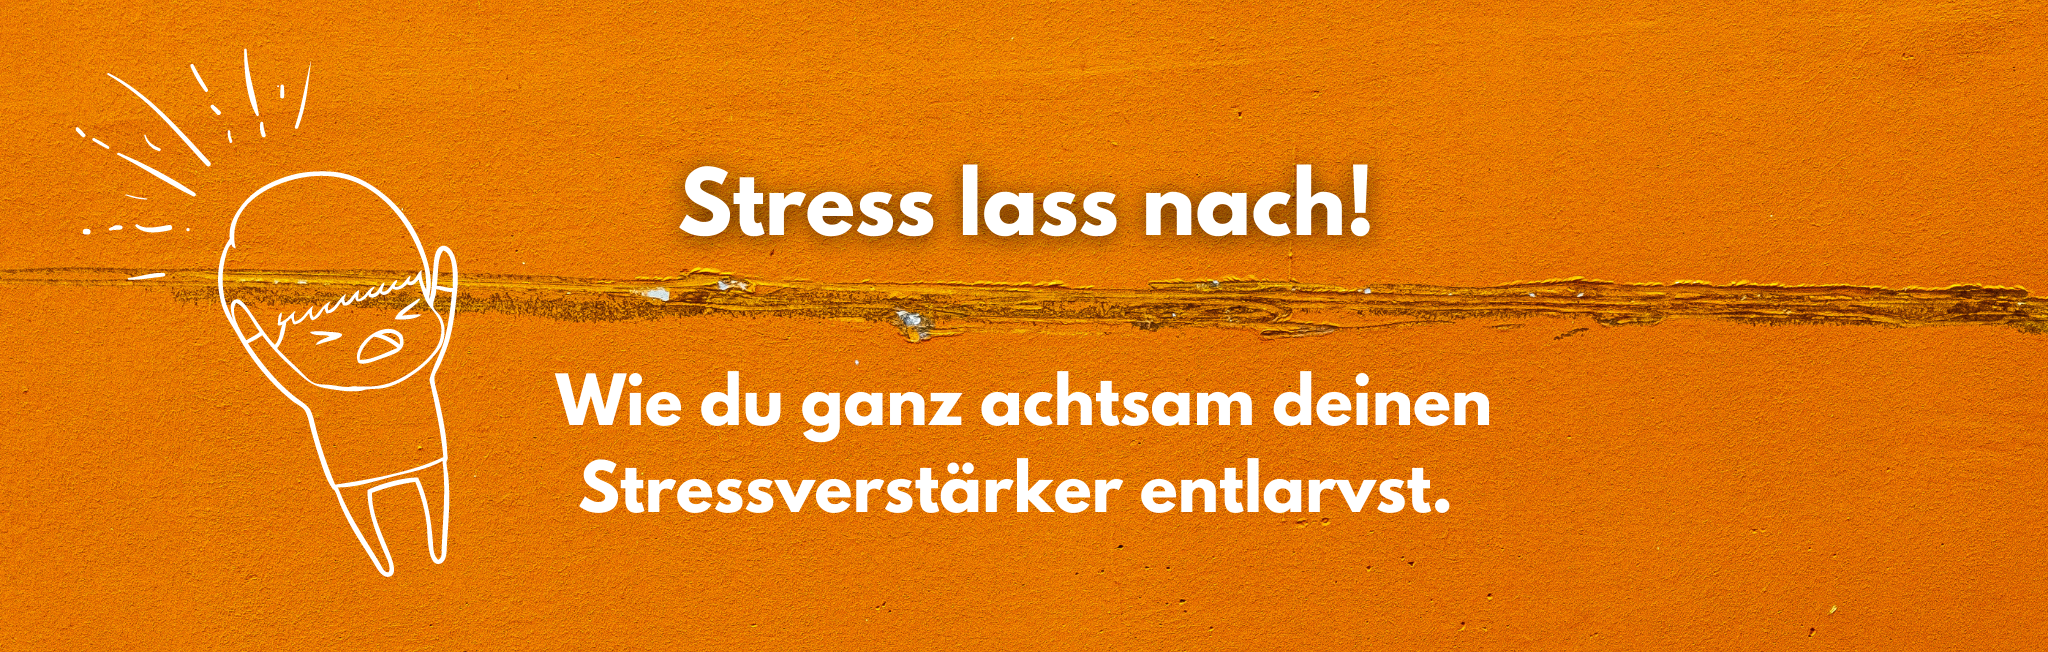 Achtsam die eigenen Stressverstärker entlarven.